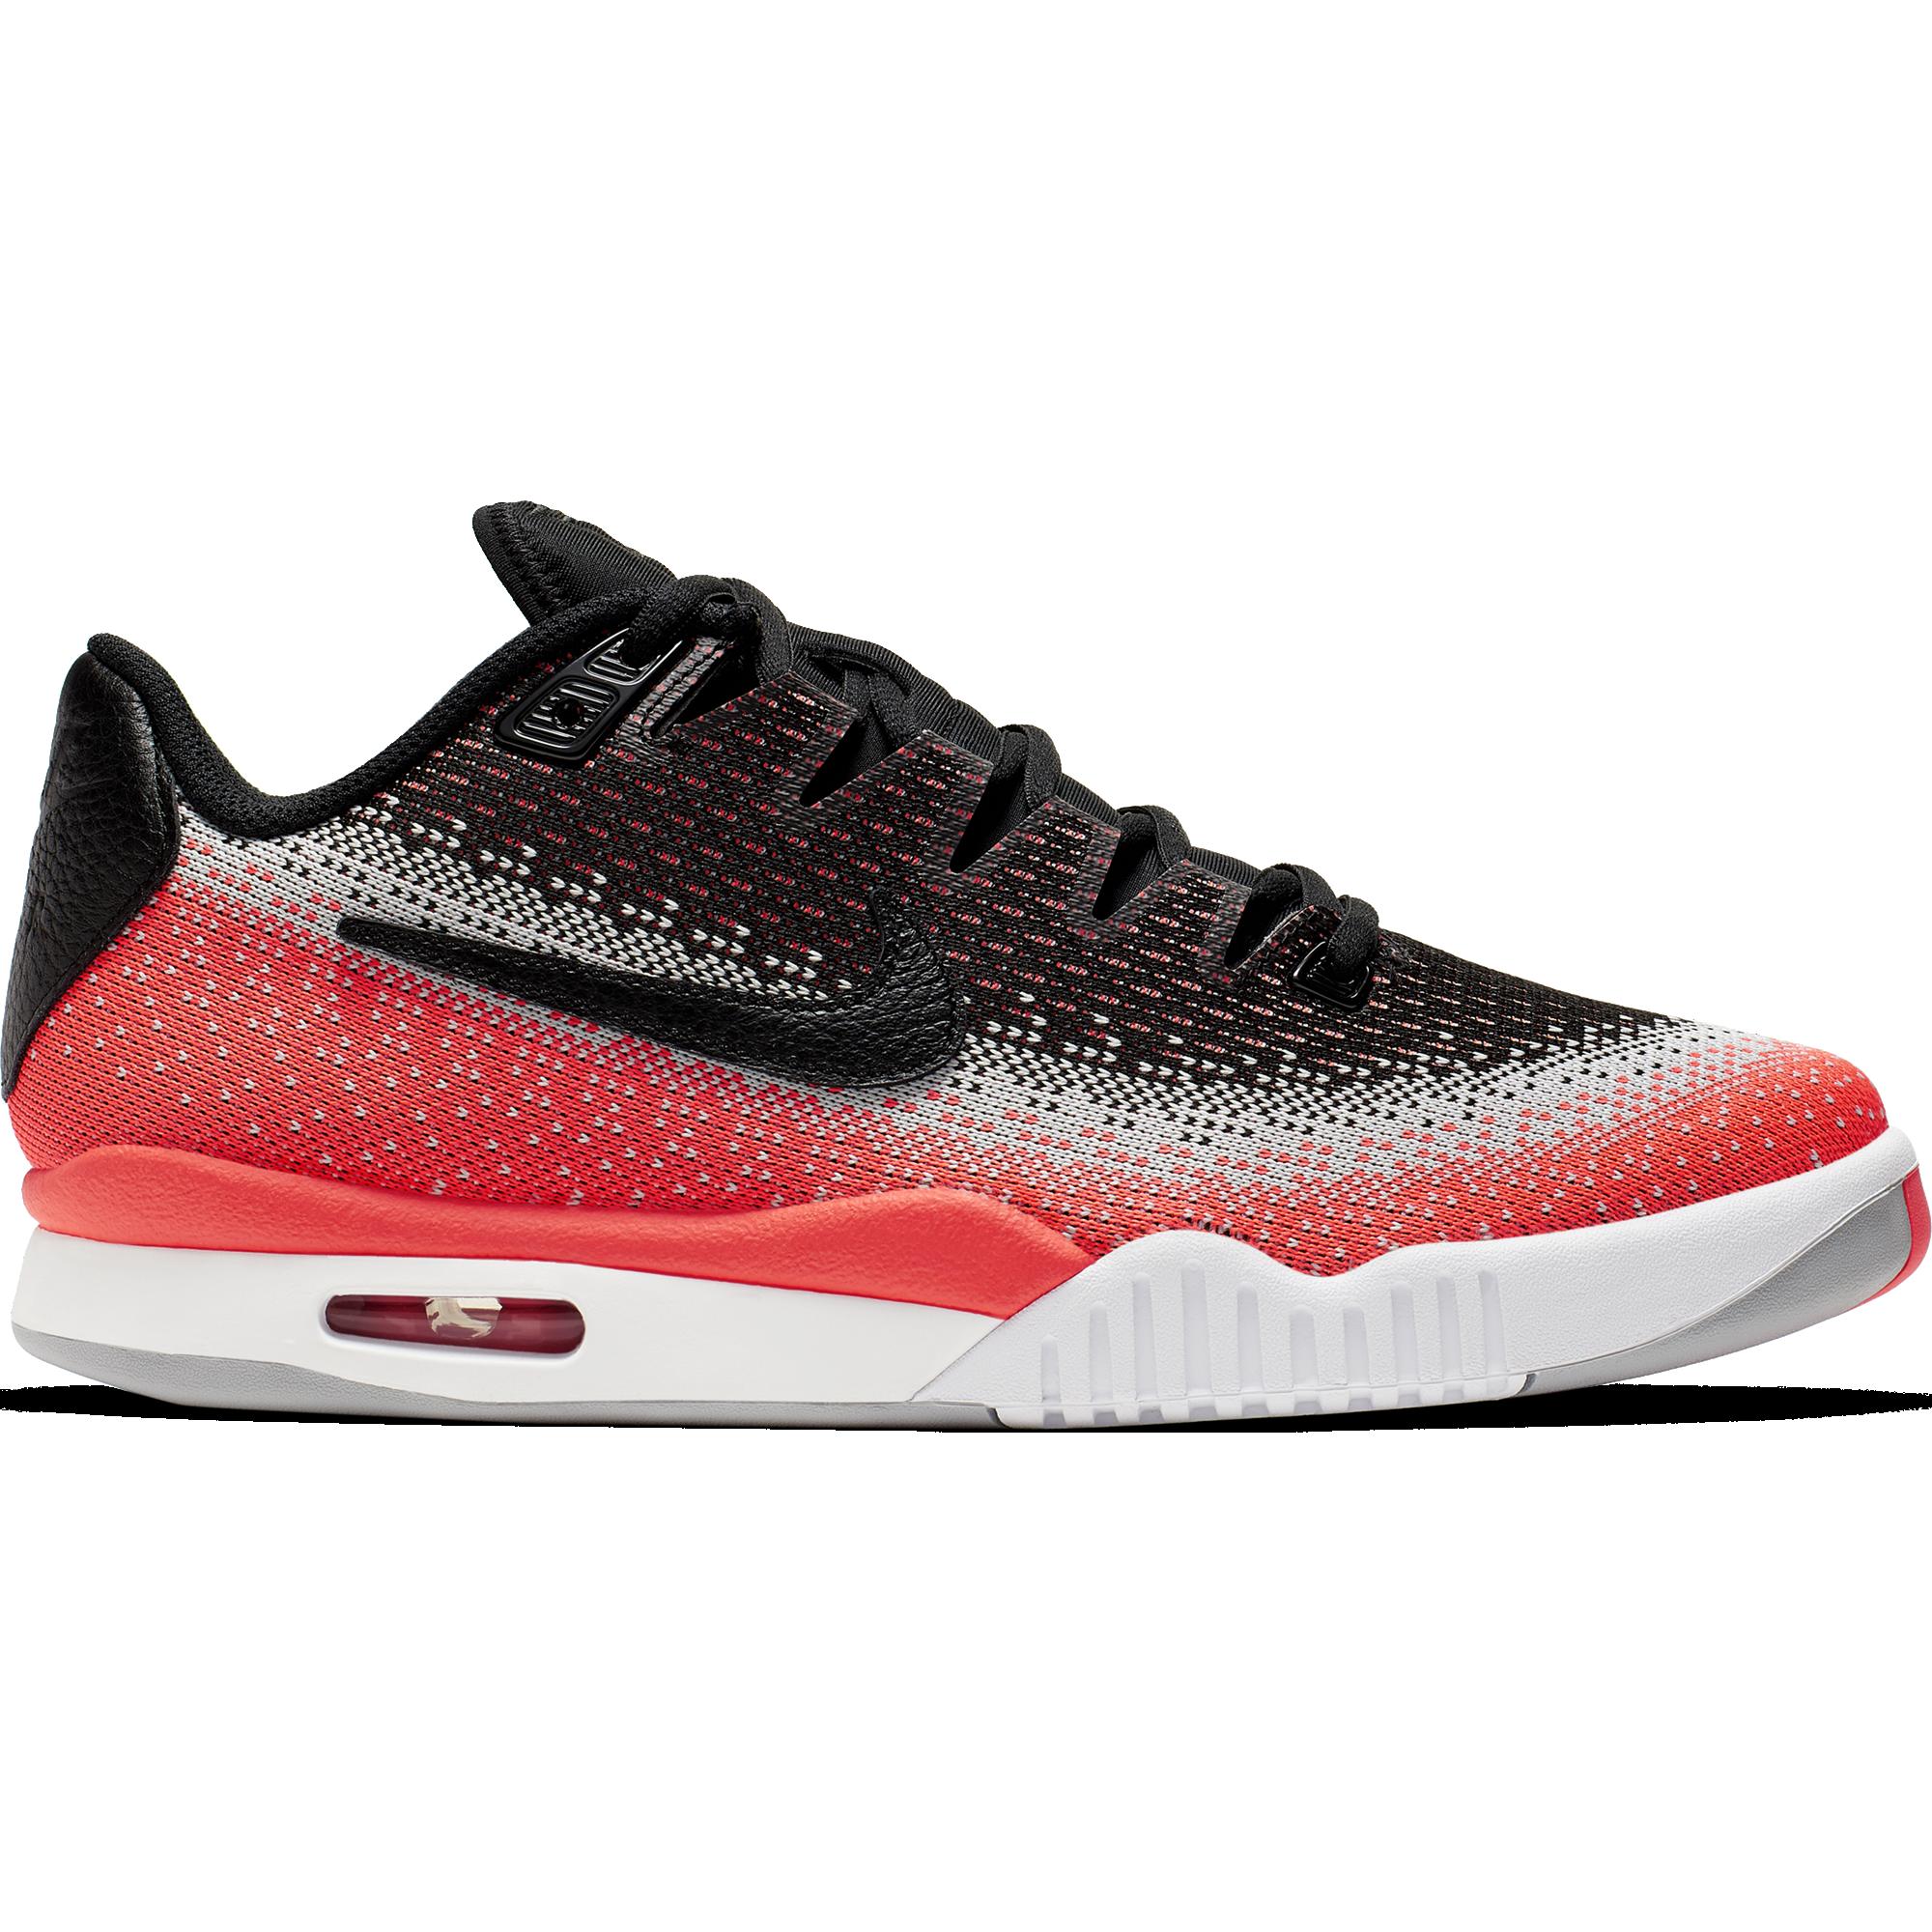 Nike Vapor X TC Knit Men's Tennis Shoe